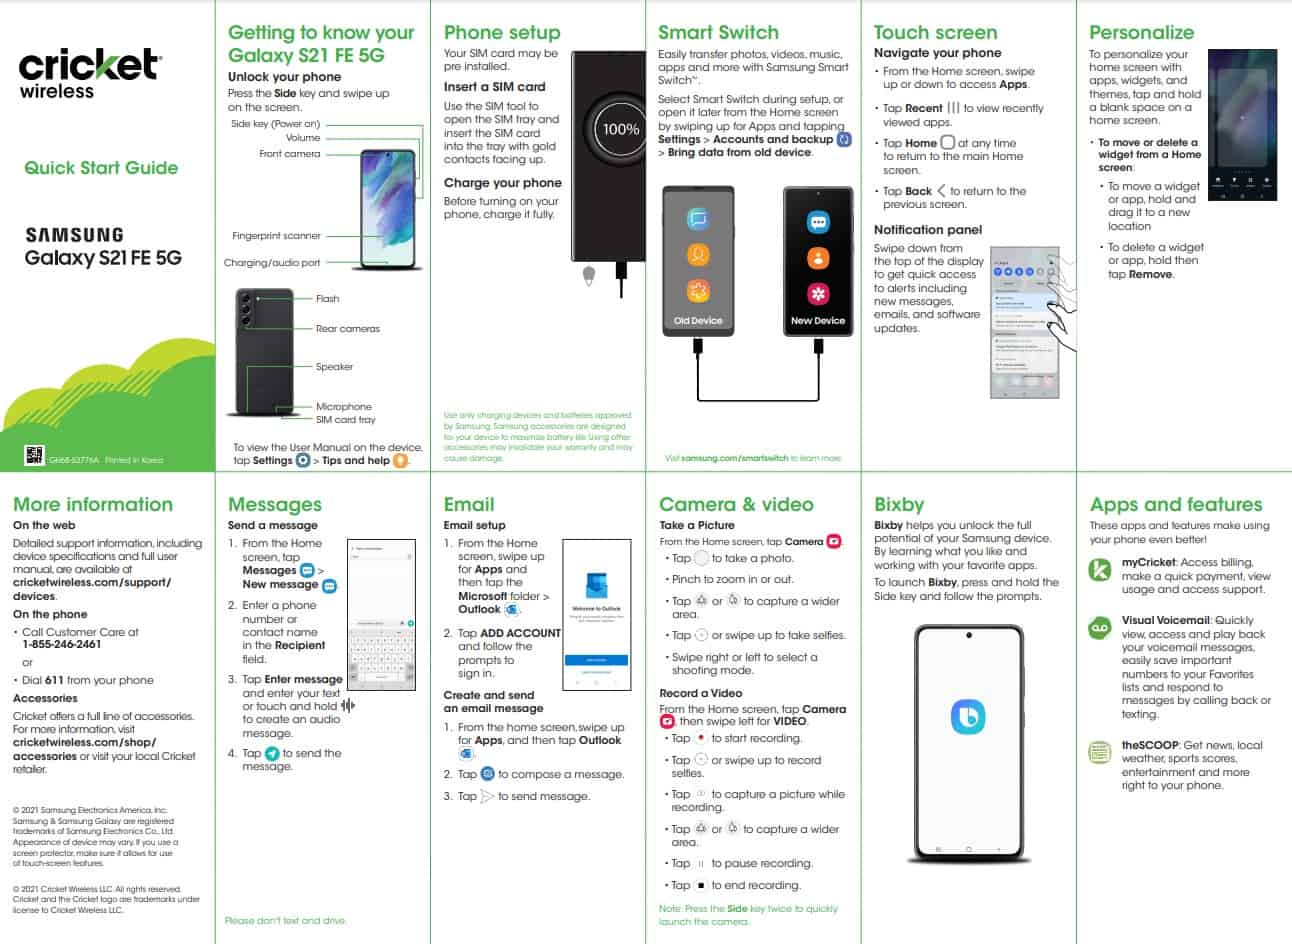 Samsung Galaxy S21 FE leak quick start guide cricket wireless